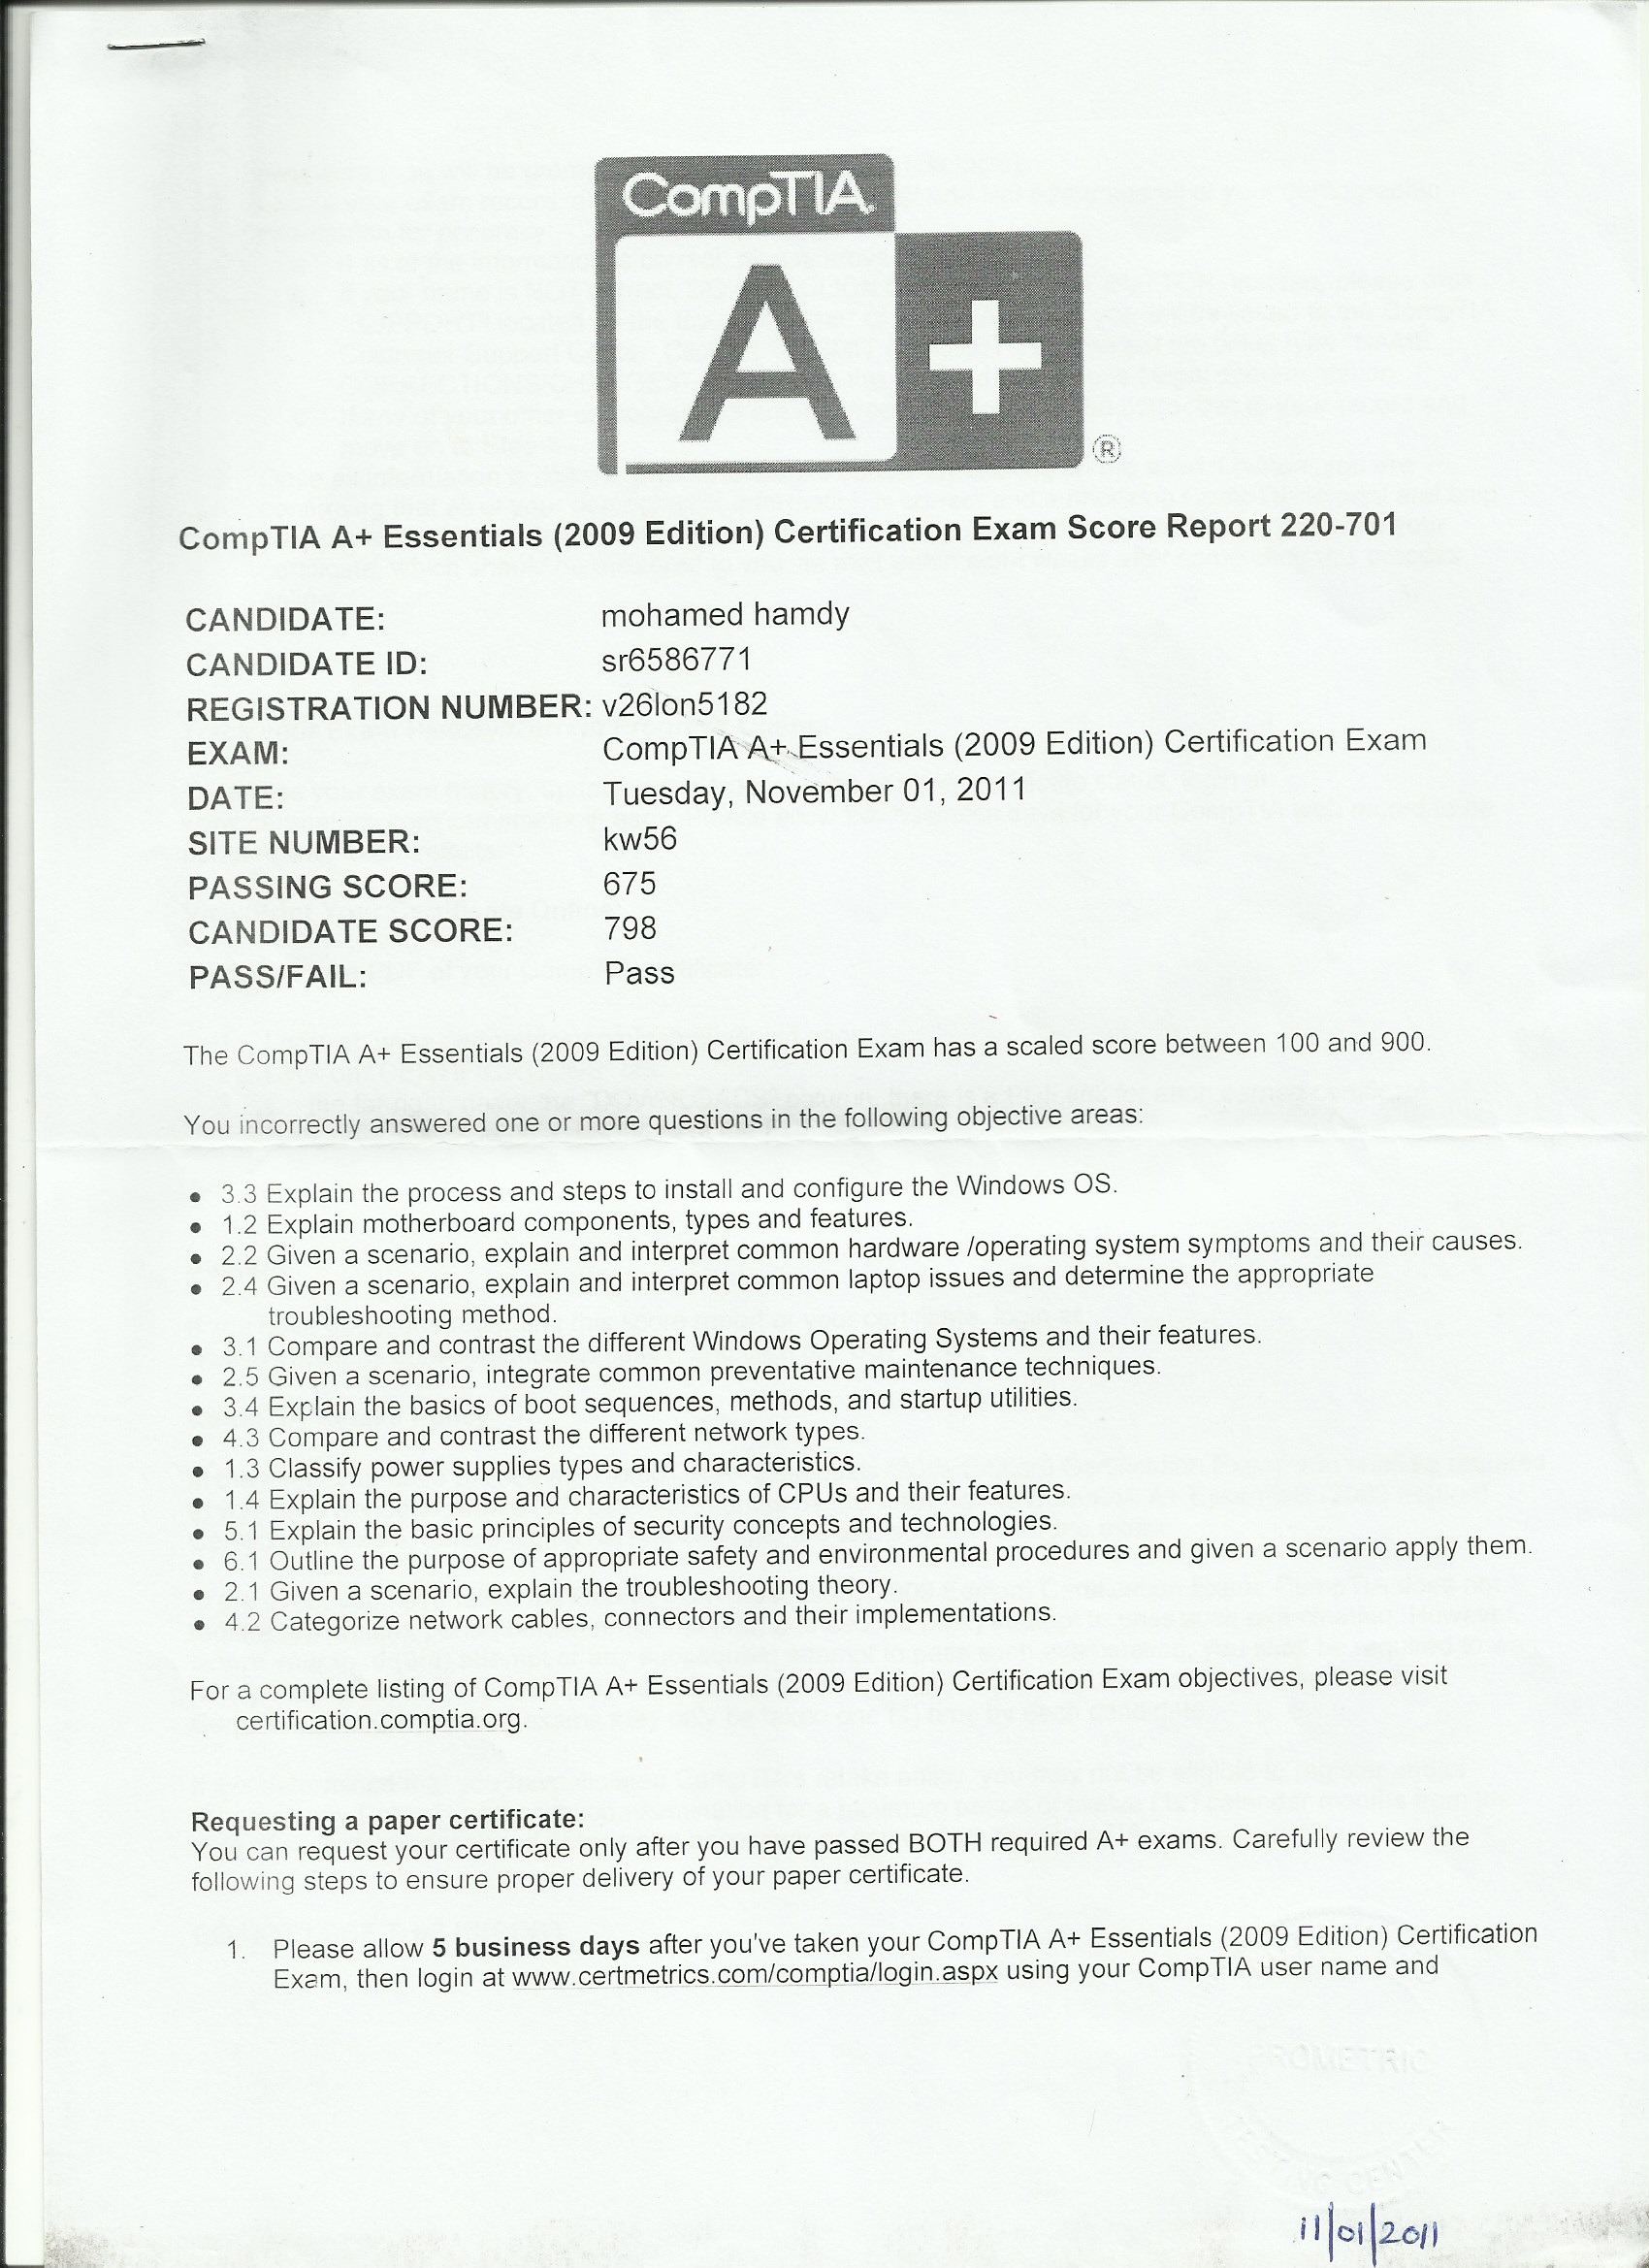 Muhammad hamdi bayt a certificate xflitez Choice Image